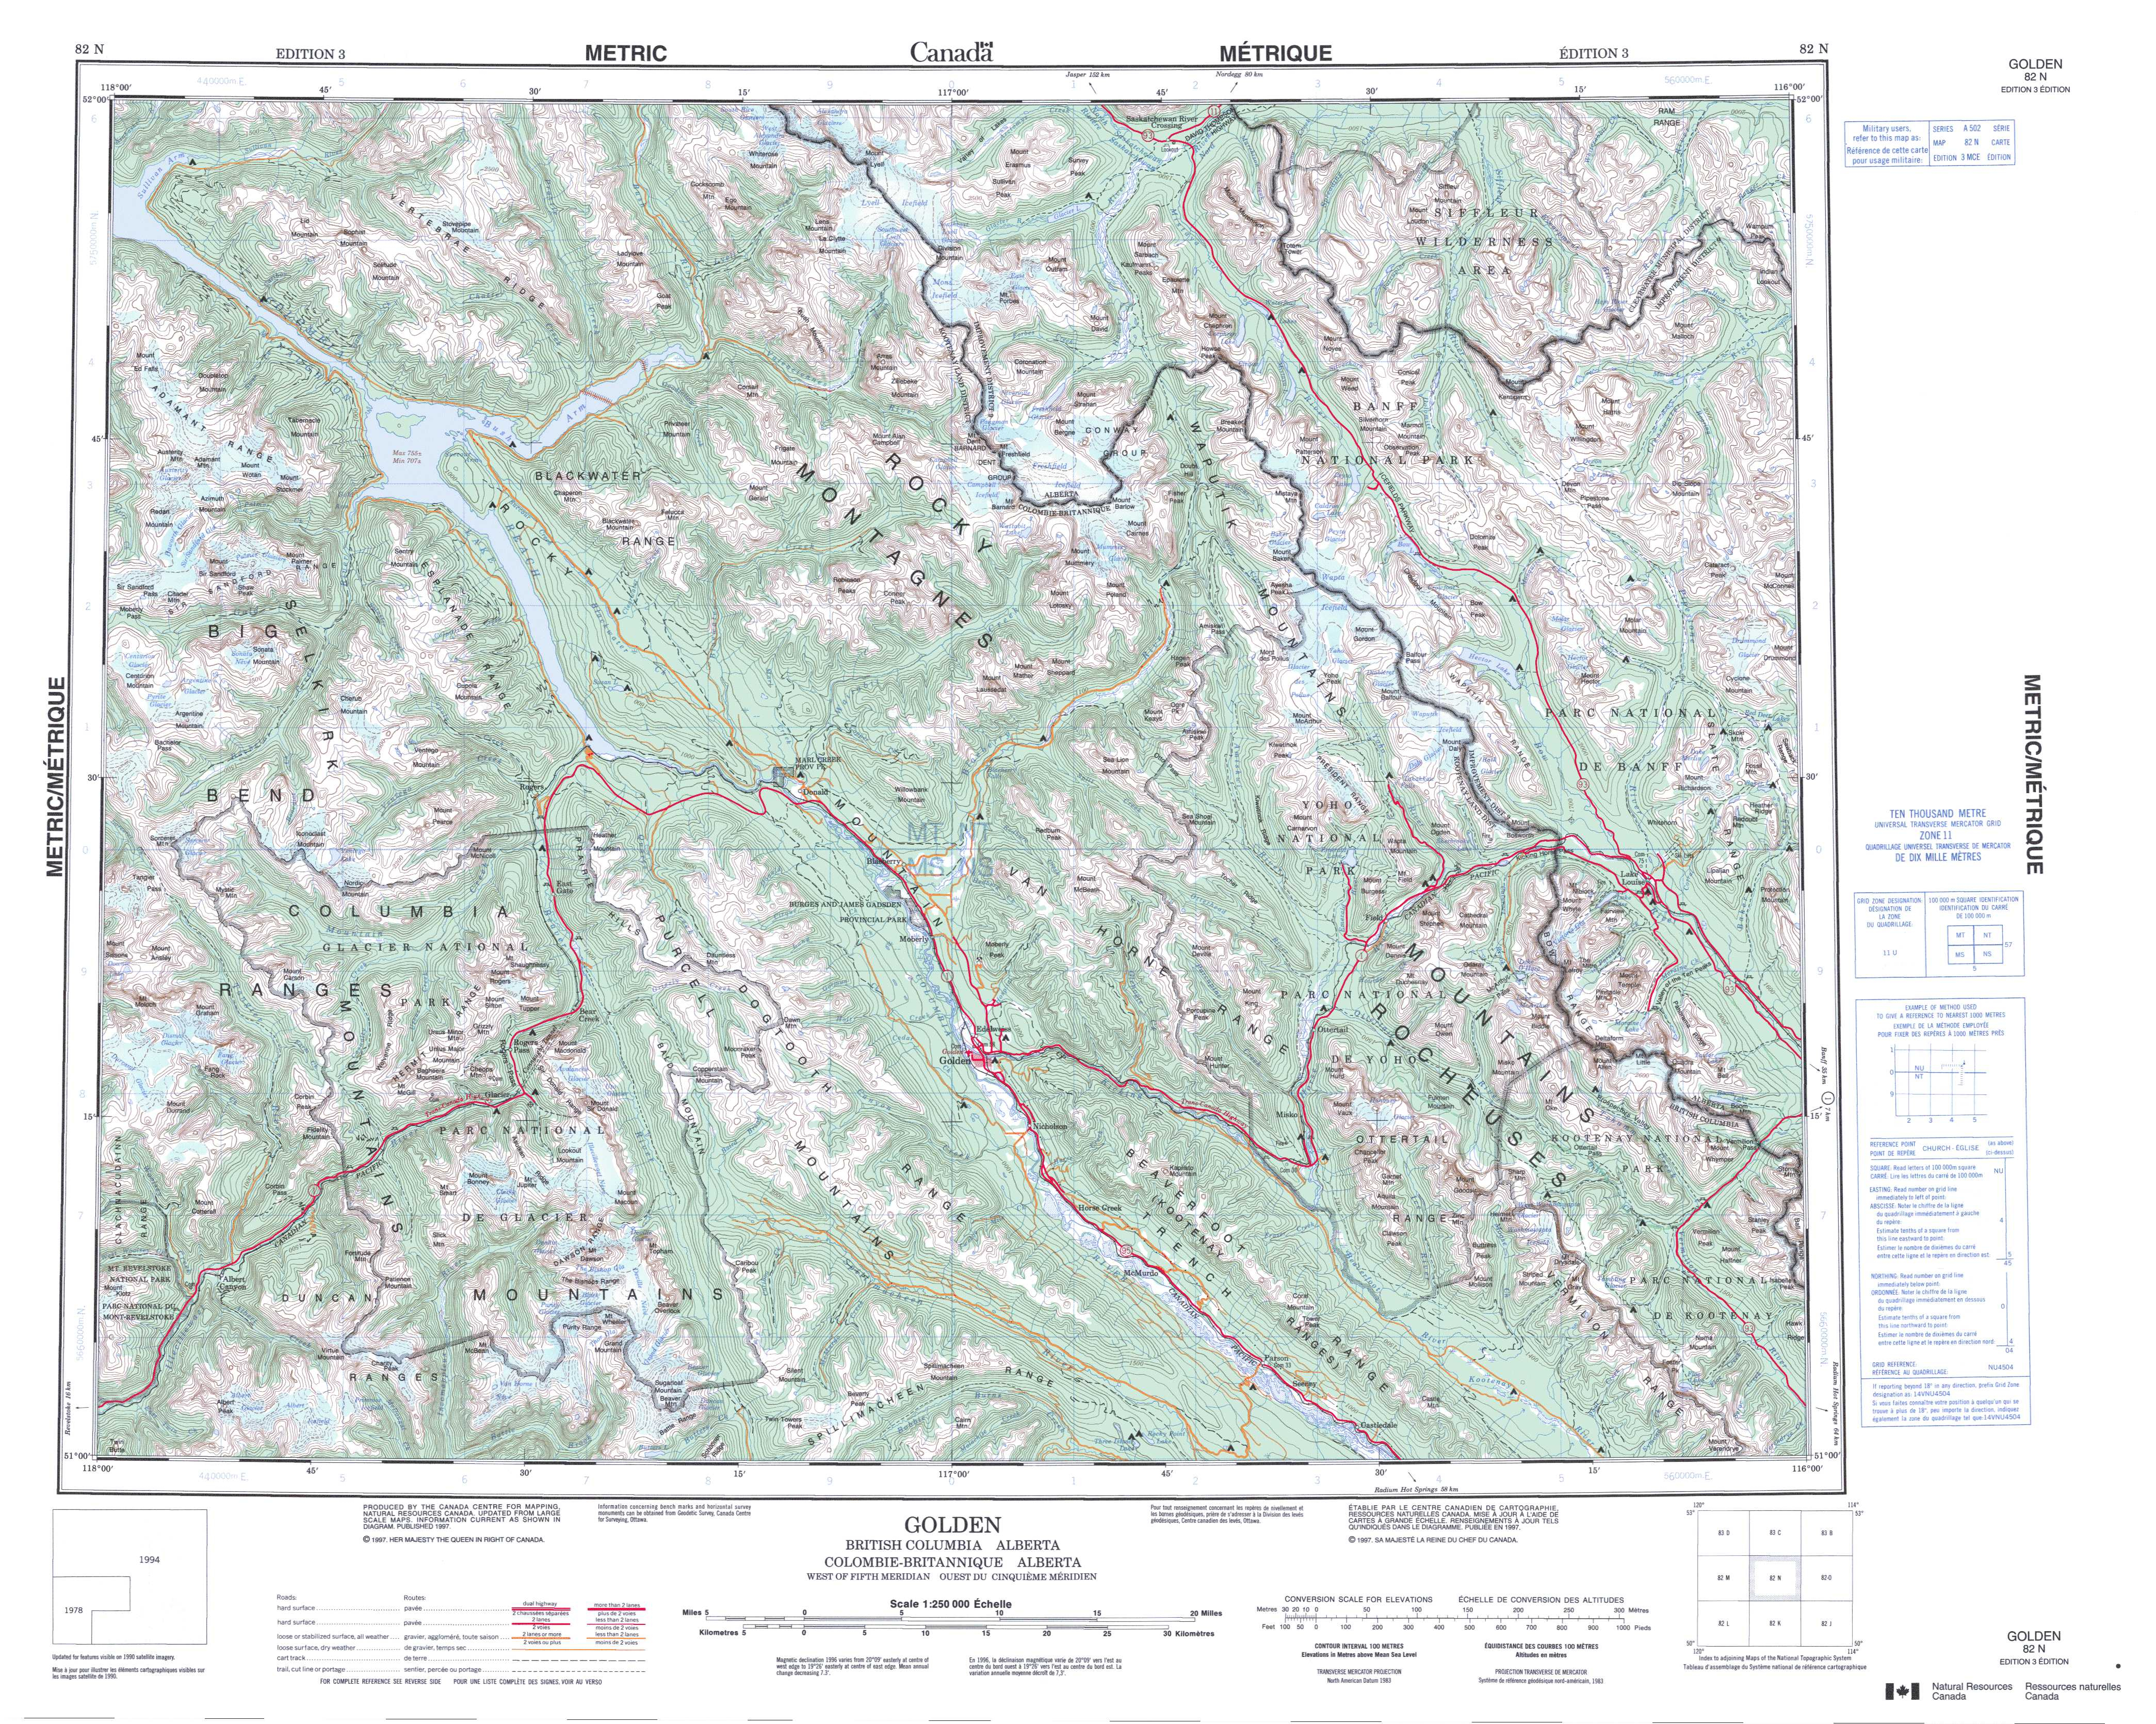 Printable Topographic Map Of Golden 082N, Ab - Free Printable Topo Maps